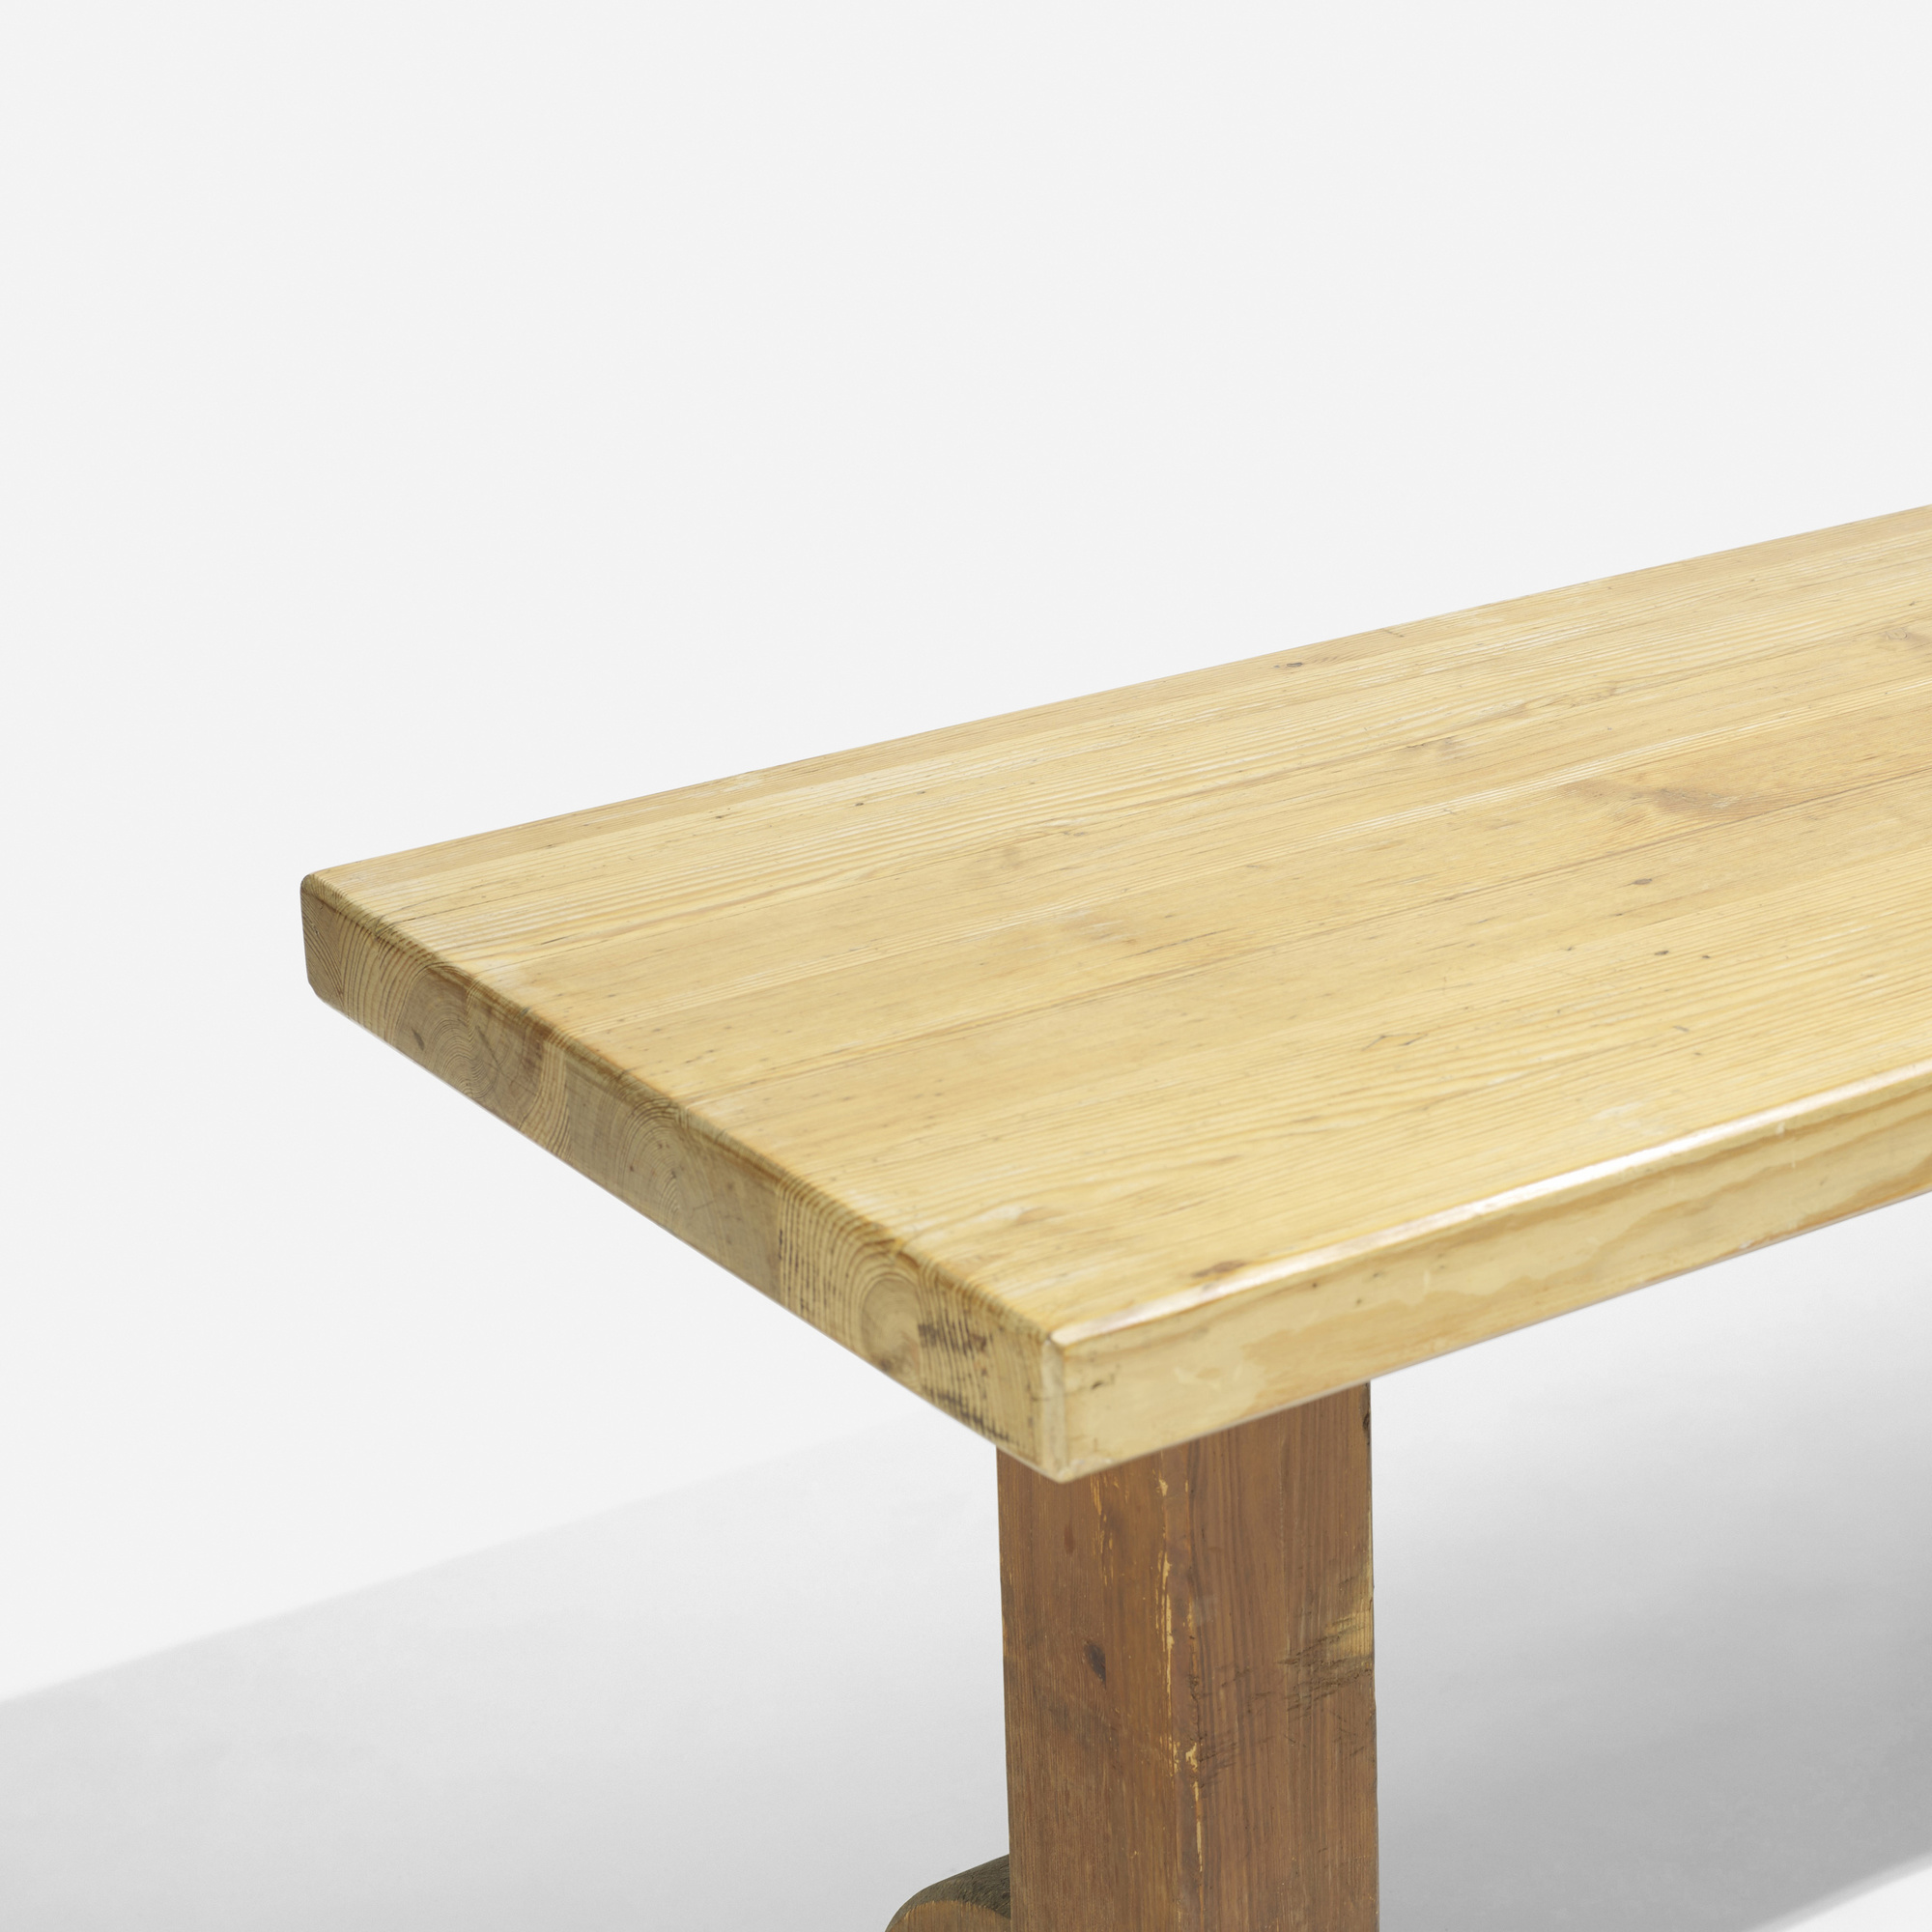 262: Axel Einar Hjorth / Sandhamn table (2 of 2)